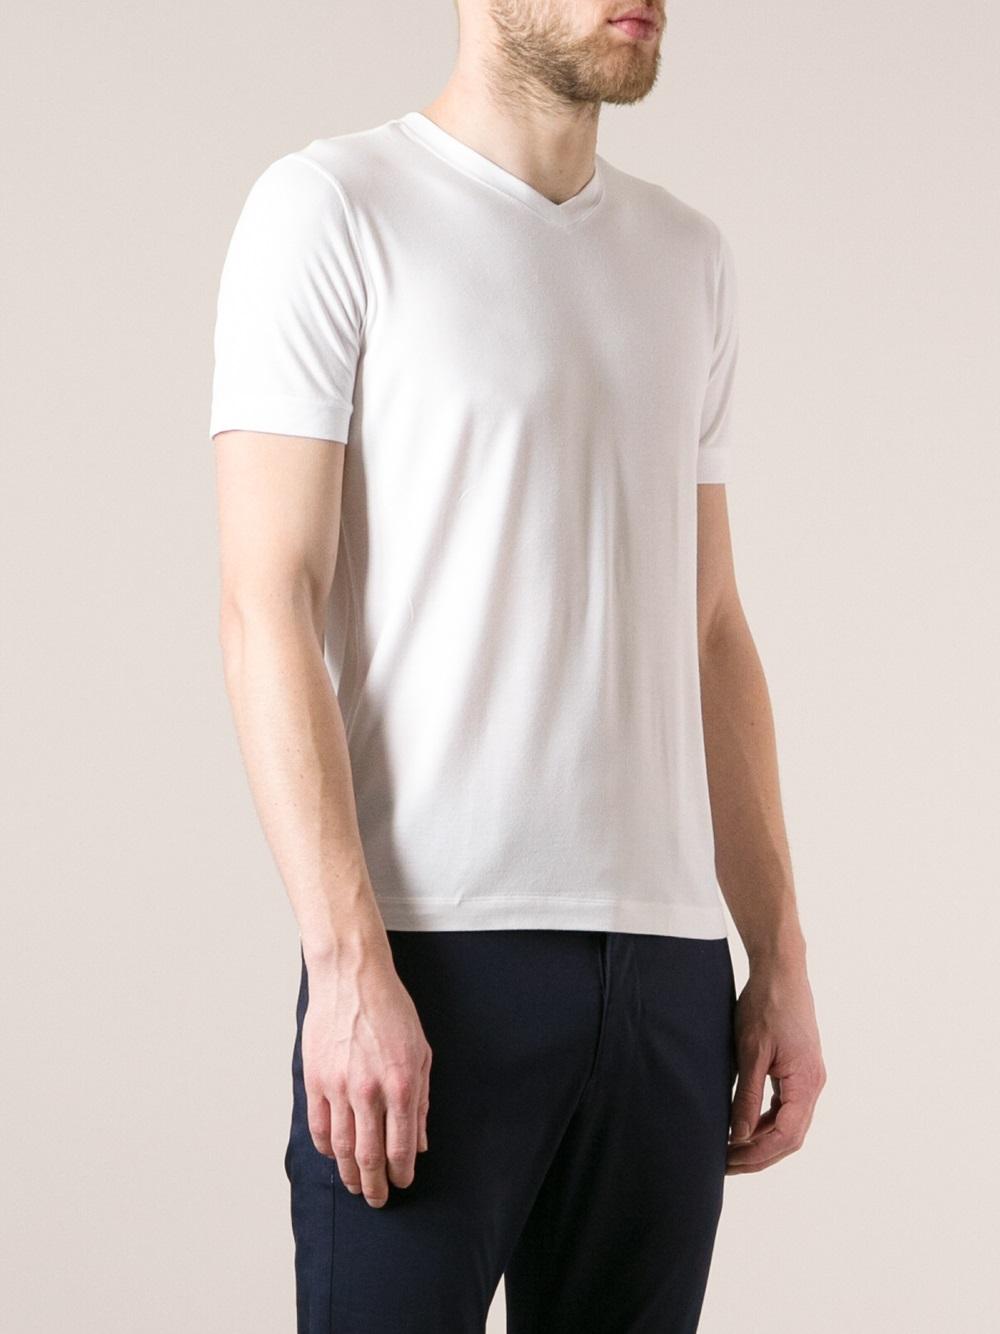 Giorgio Armani Bamboo Vneck Tshirt In White For Men Lyst